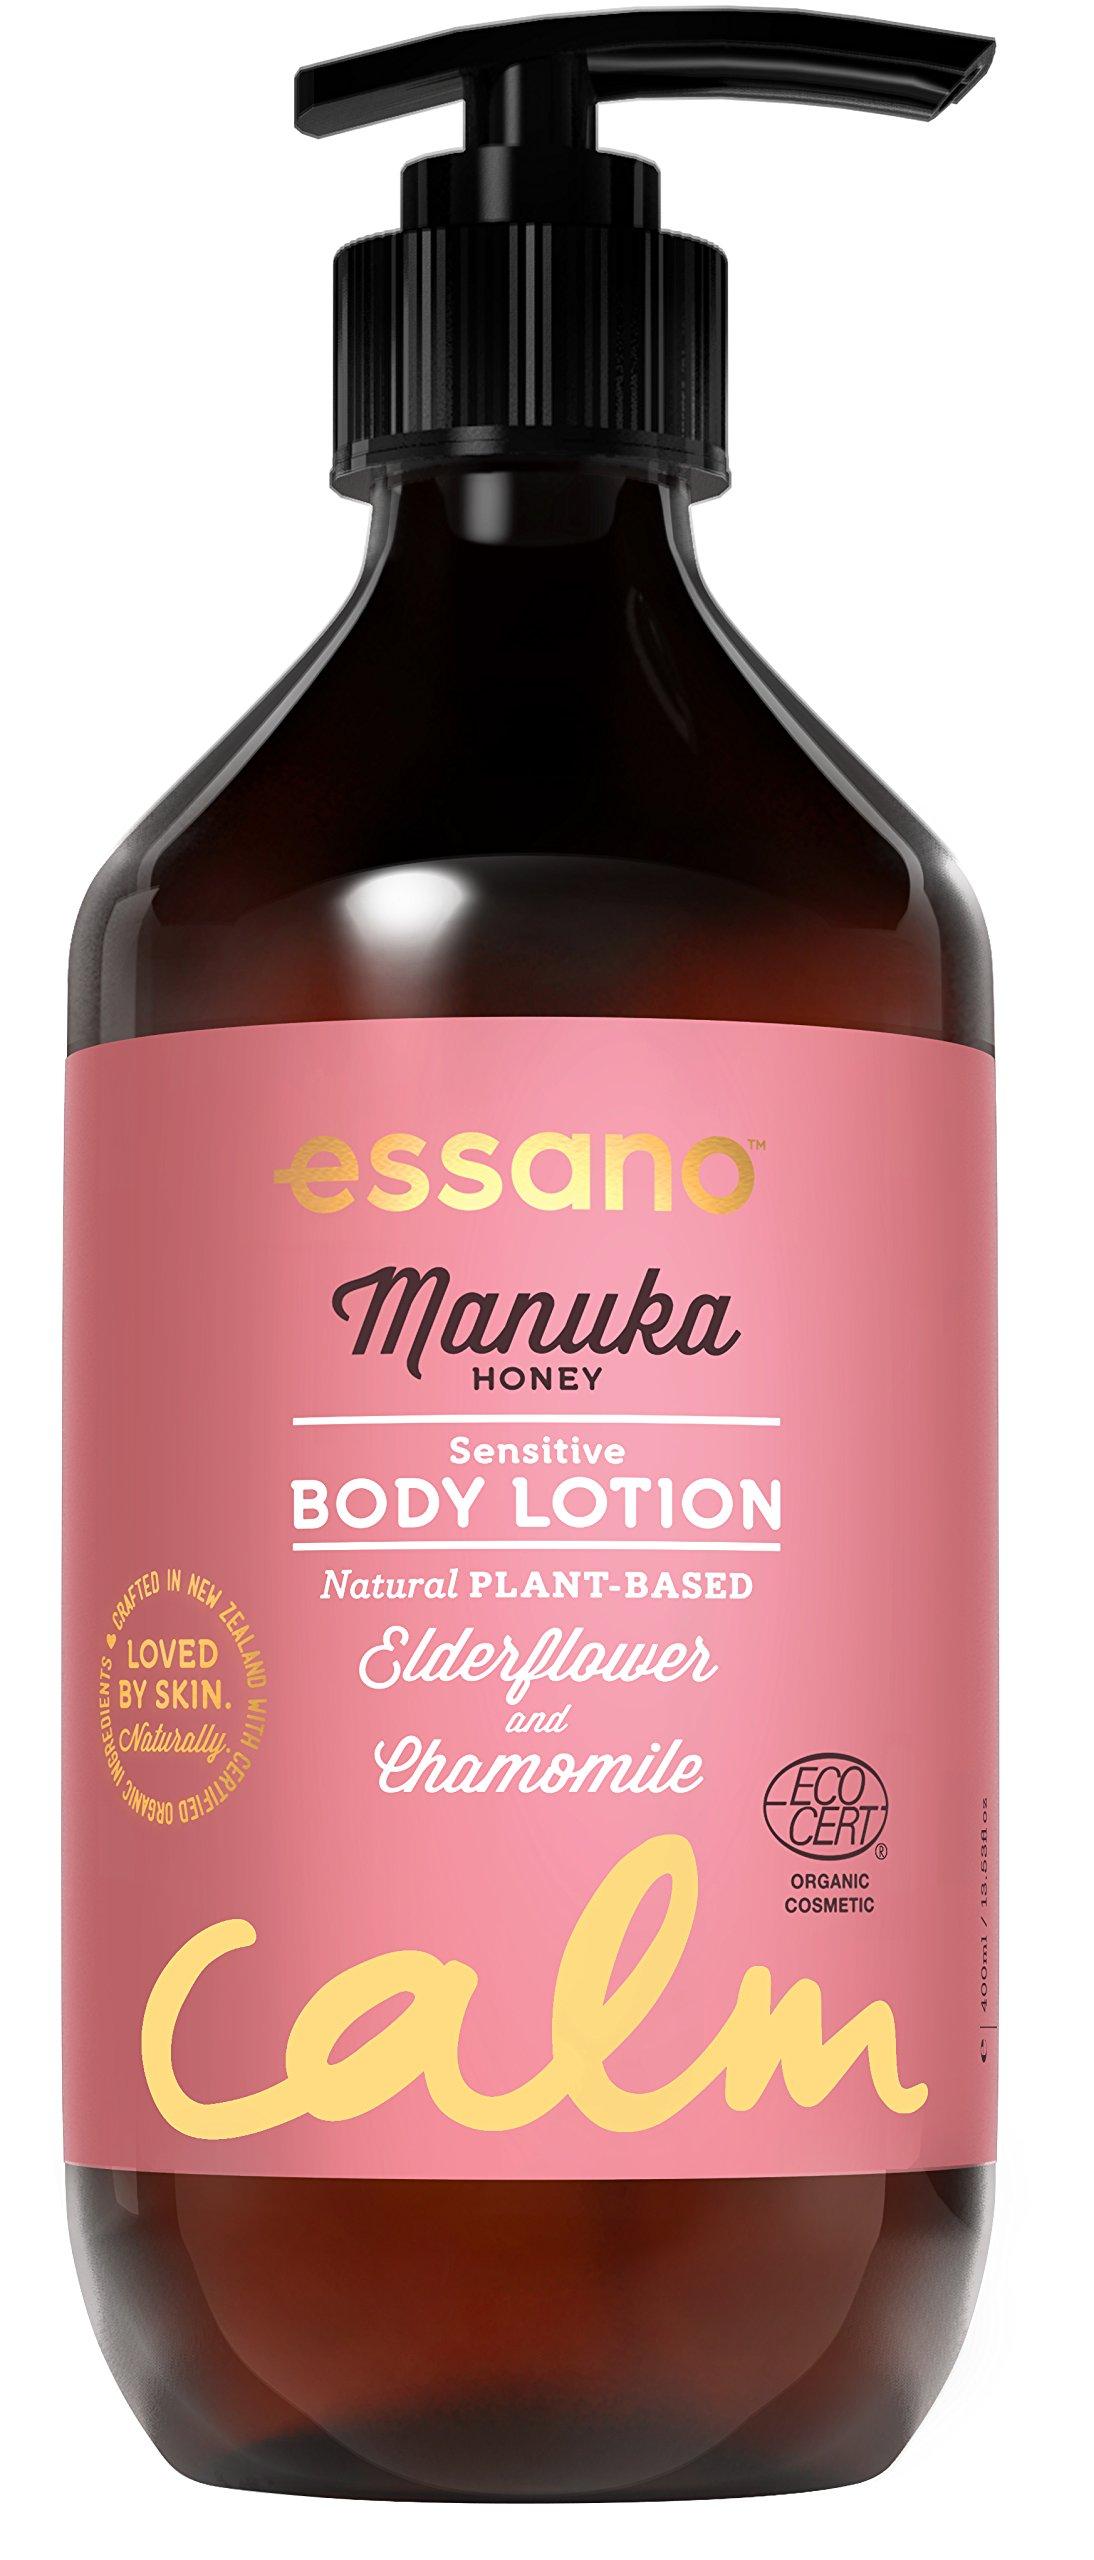 Essano Certified Organic Manuka Honey Sensitive Body Lotion, 400ml (13.5oz)